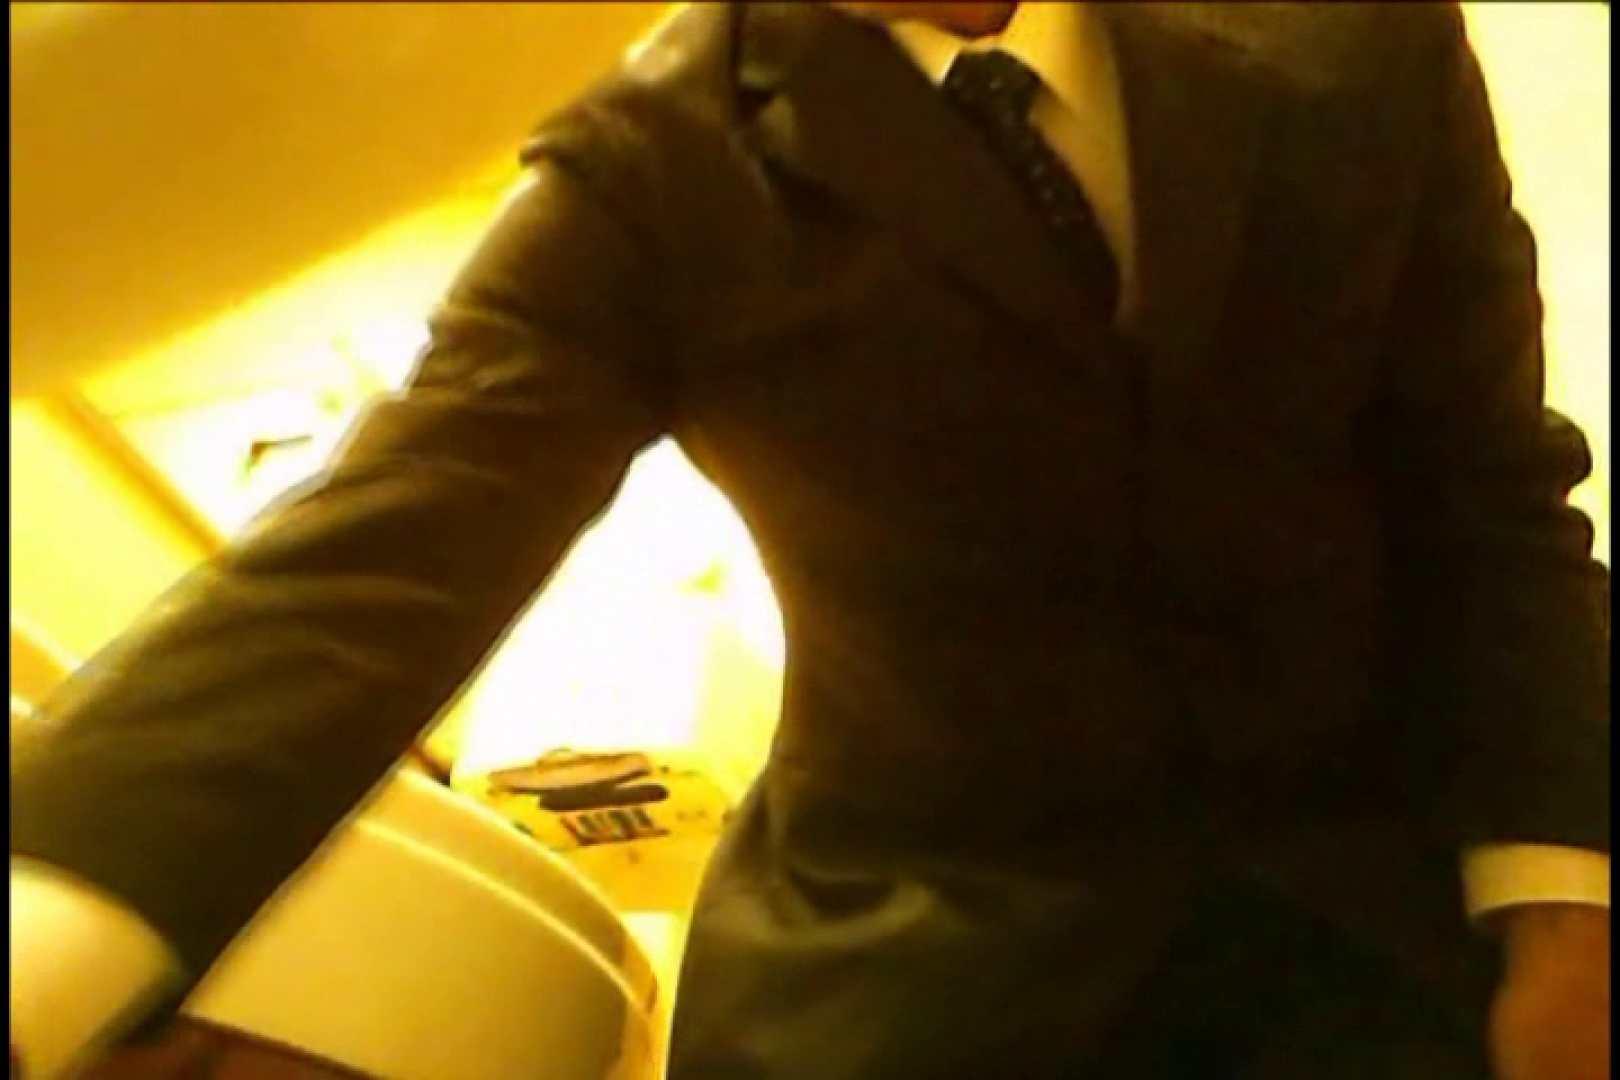 Gボーイ初投稿!掴み取りさんの洗面所覗き!in新幹線!VOL.01 スーツボーイズ | 男天国  103pic 28